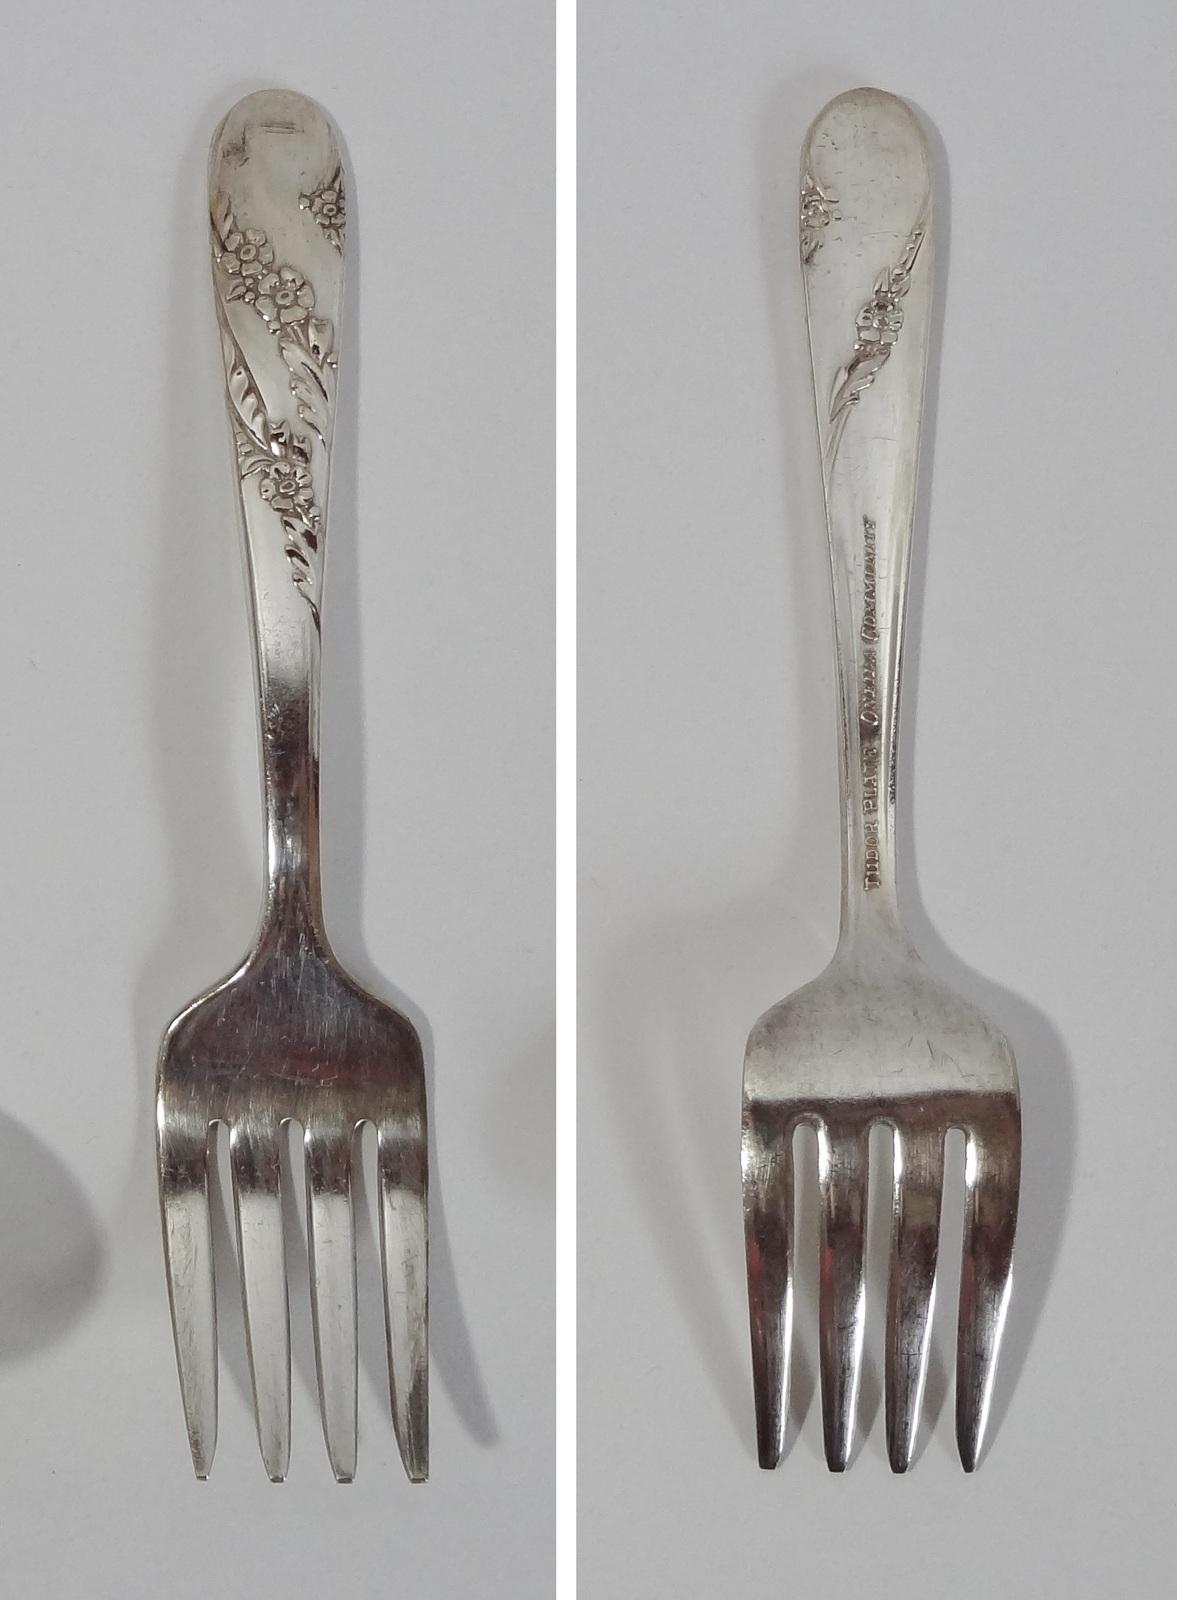 Oneida Community Tudor Plate Floral Pattern Fork Tableware Cutlery Flatware  - $1.49